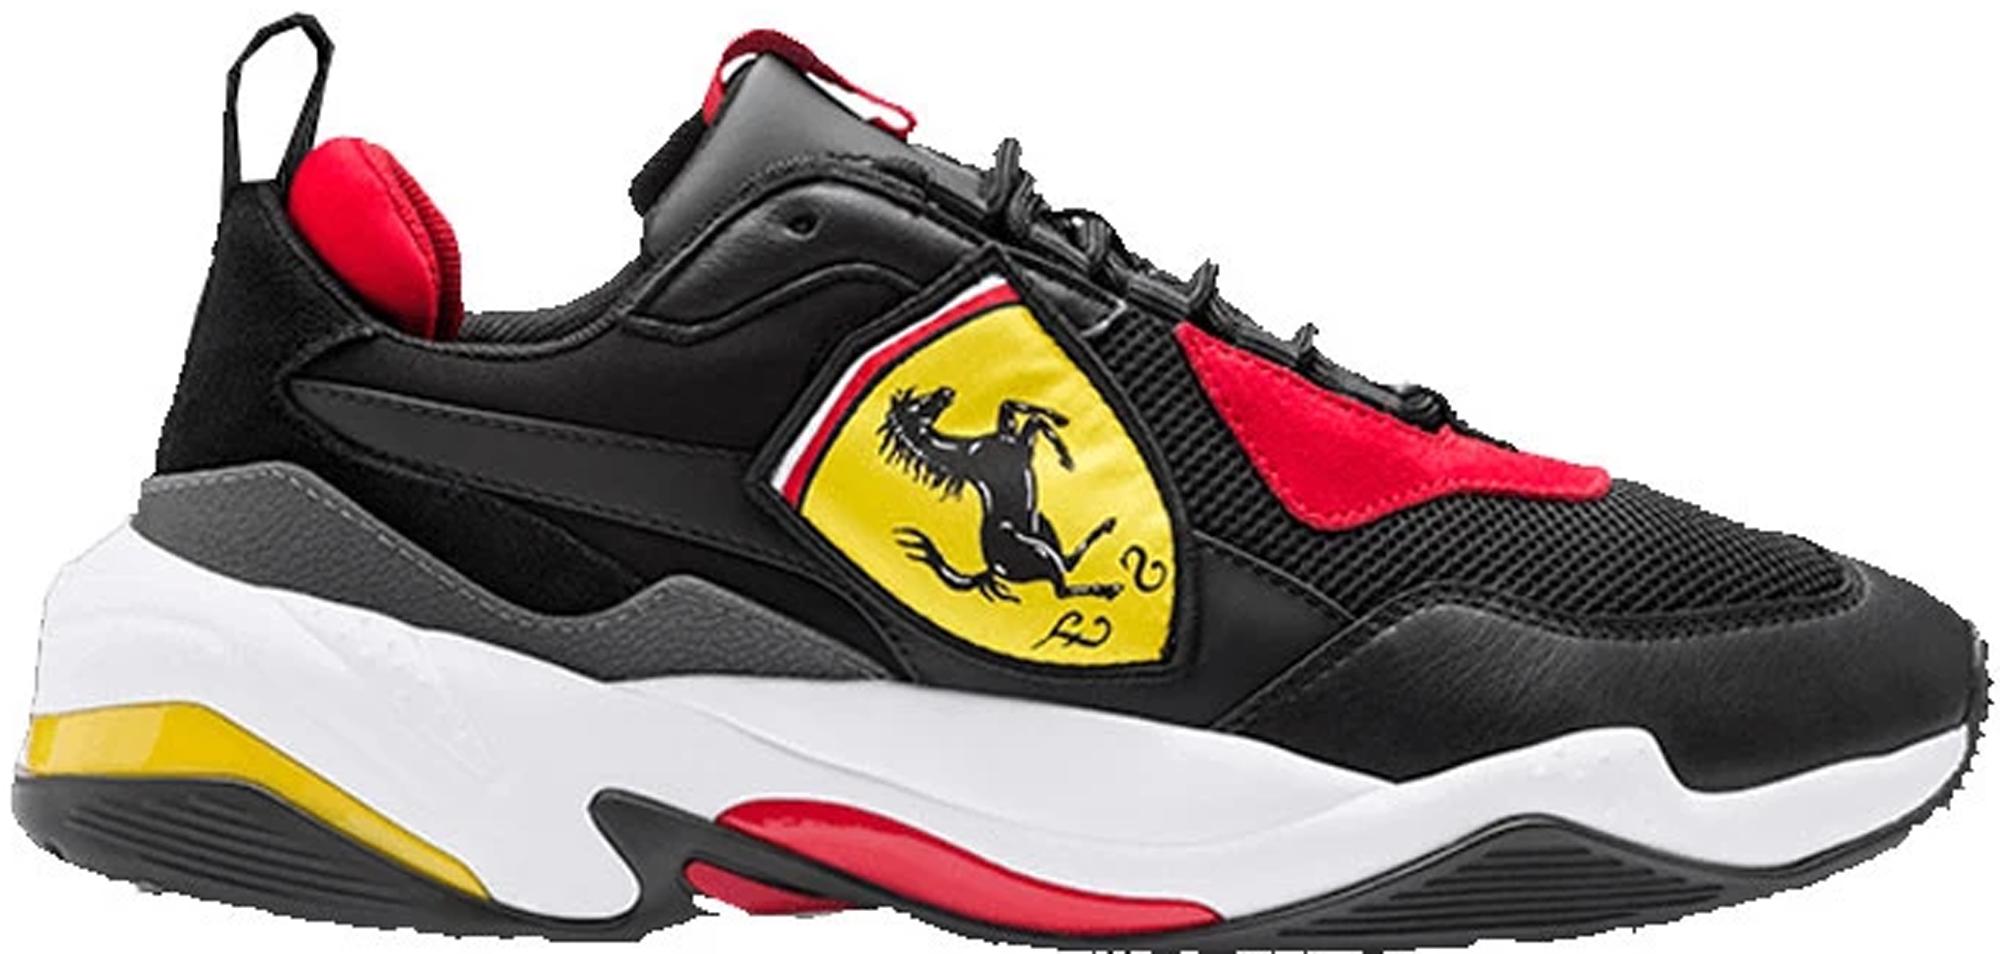 Puma Thunder Scuderia Ferrari - 339869-01